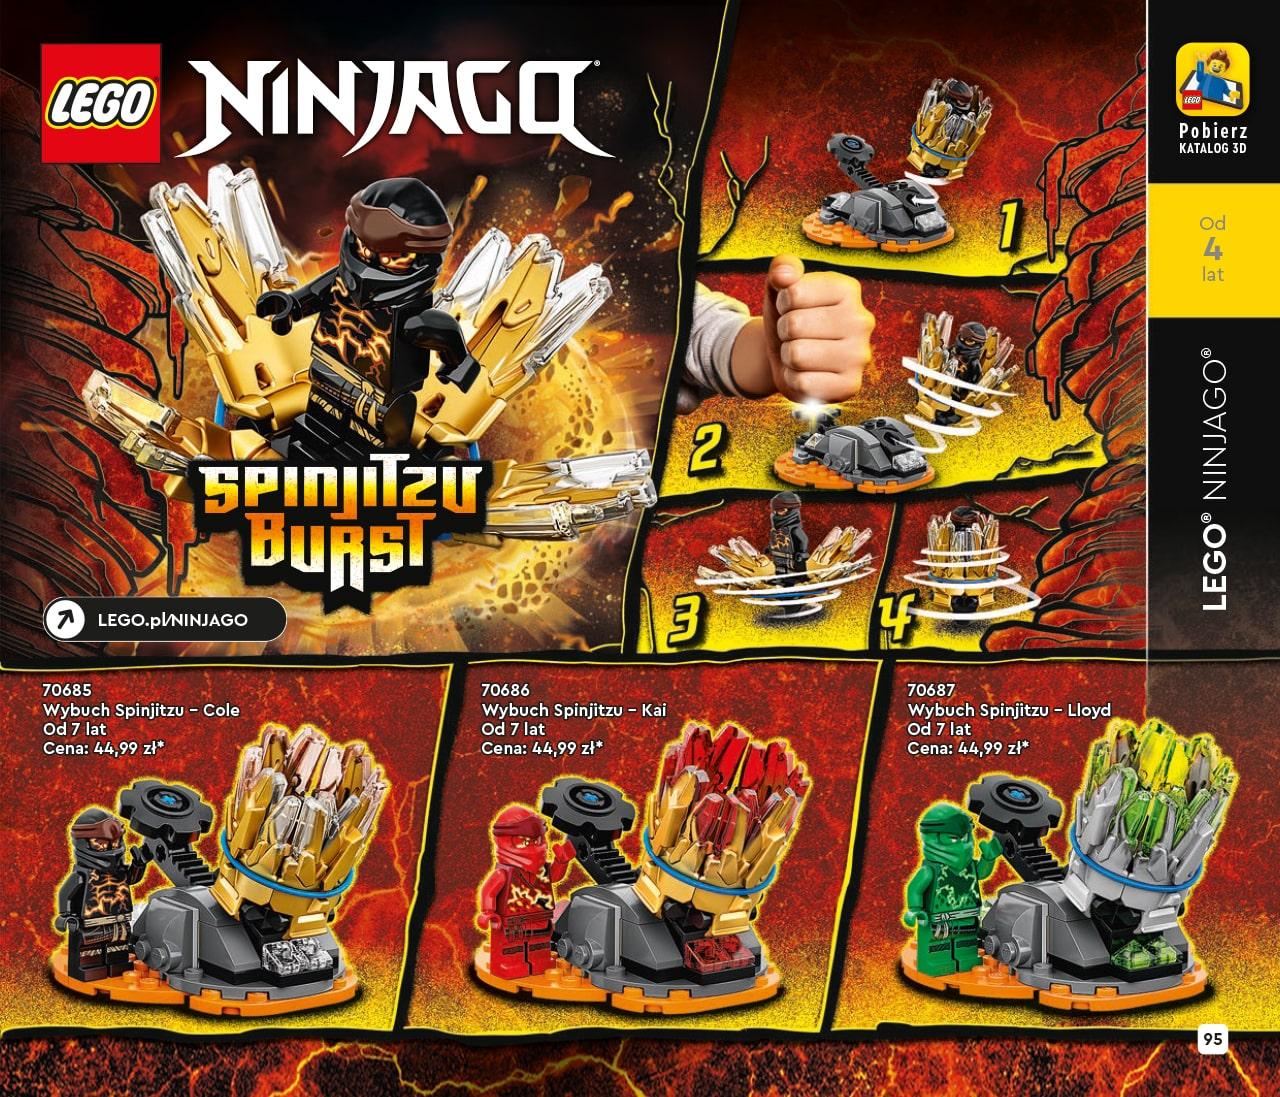 Katalog LEGO styczeń-maj 2021 - wersja polska - 95 - LEGO NINJAGO